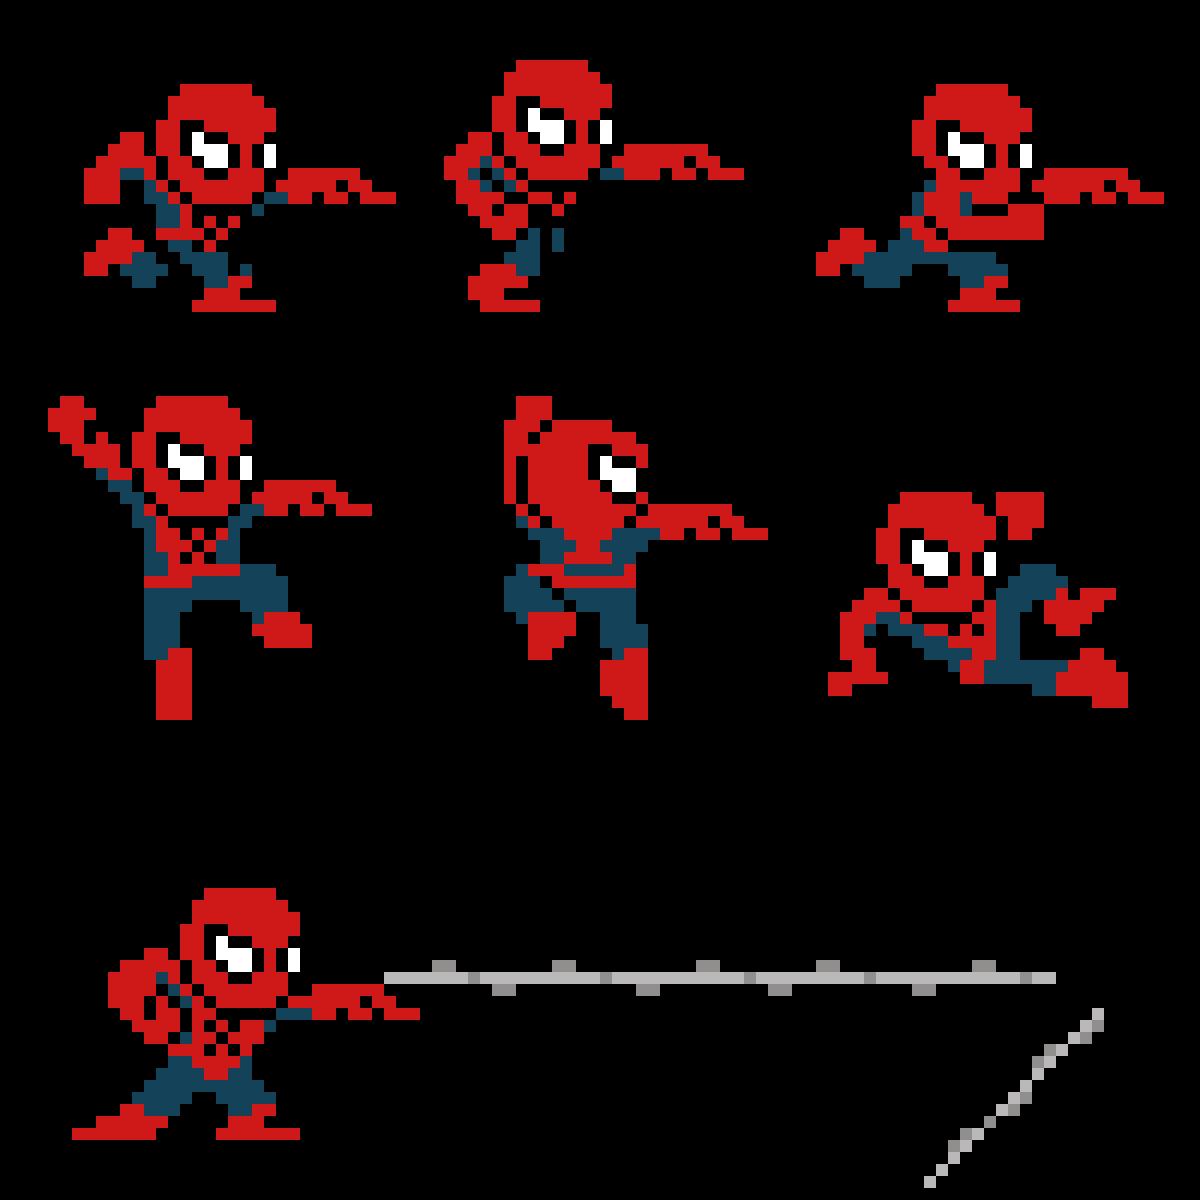 Pixilart Spider Mansprite Sheet By Jack Debris